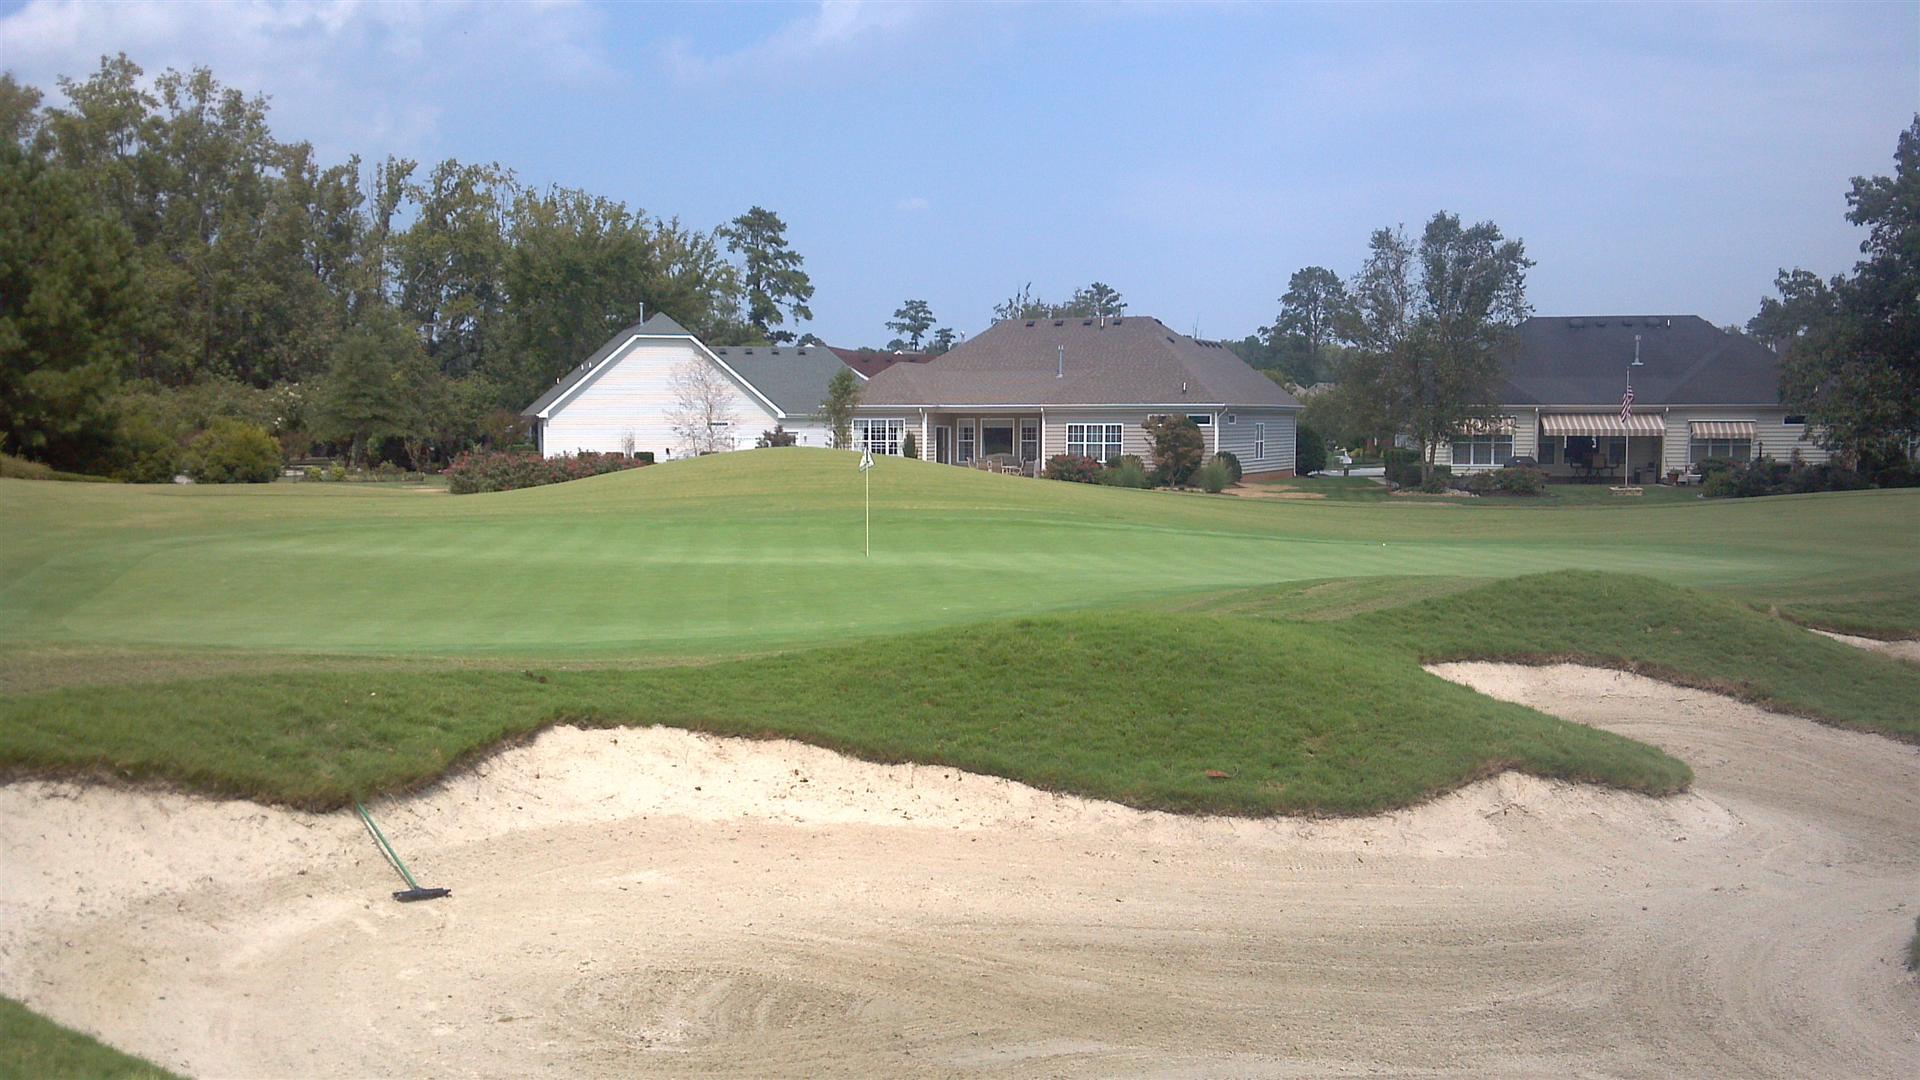 My Golf Vacation image 12